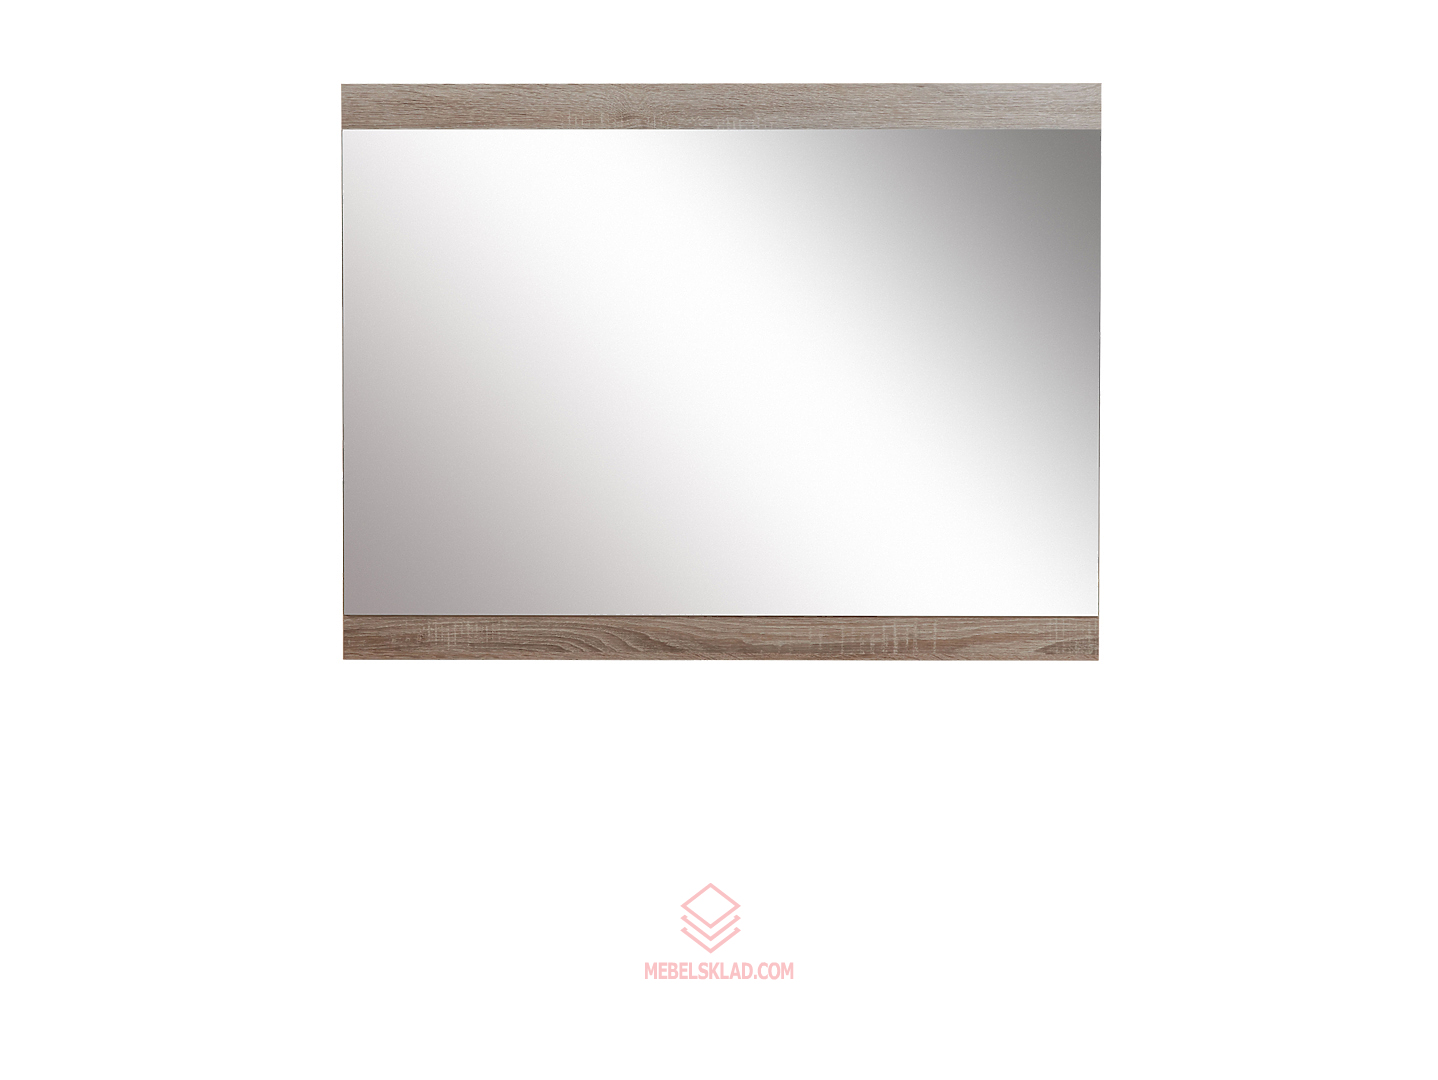 Зеркало LUS/8/10 дуб сонома темный HOMELINE за 3415 ₽